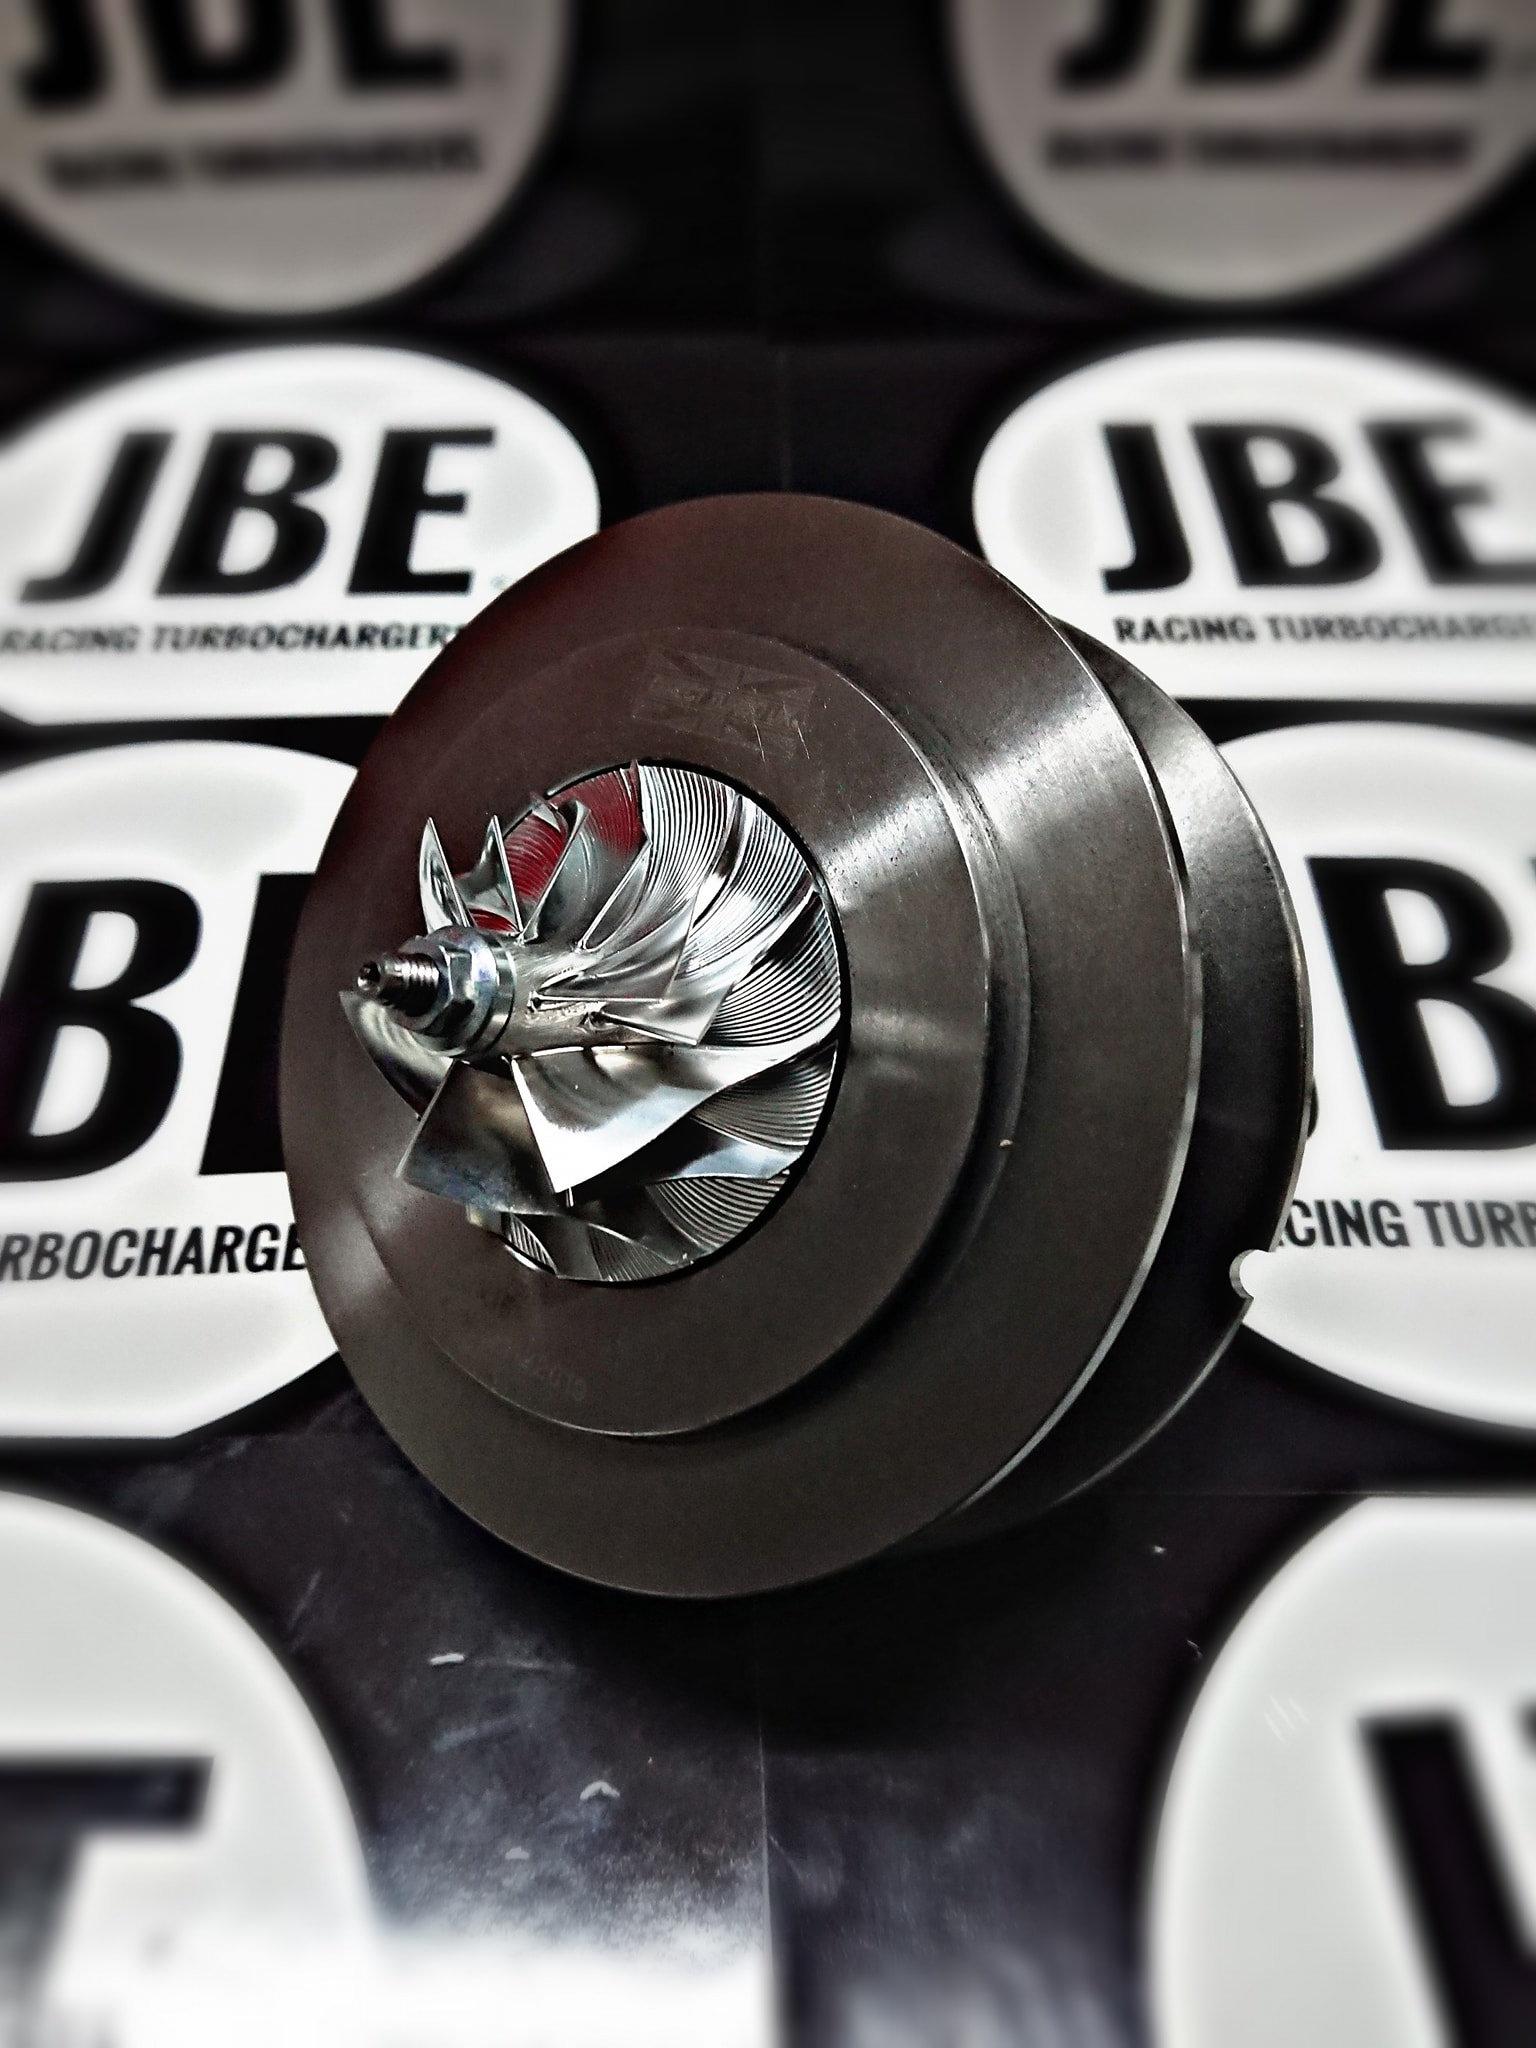 BMW 320D TF035 49135-05620 racing hybrid turbo | JBE RACING TURBO